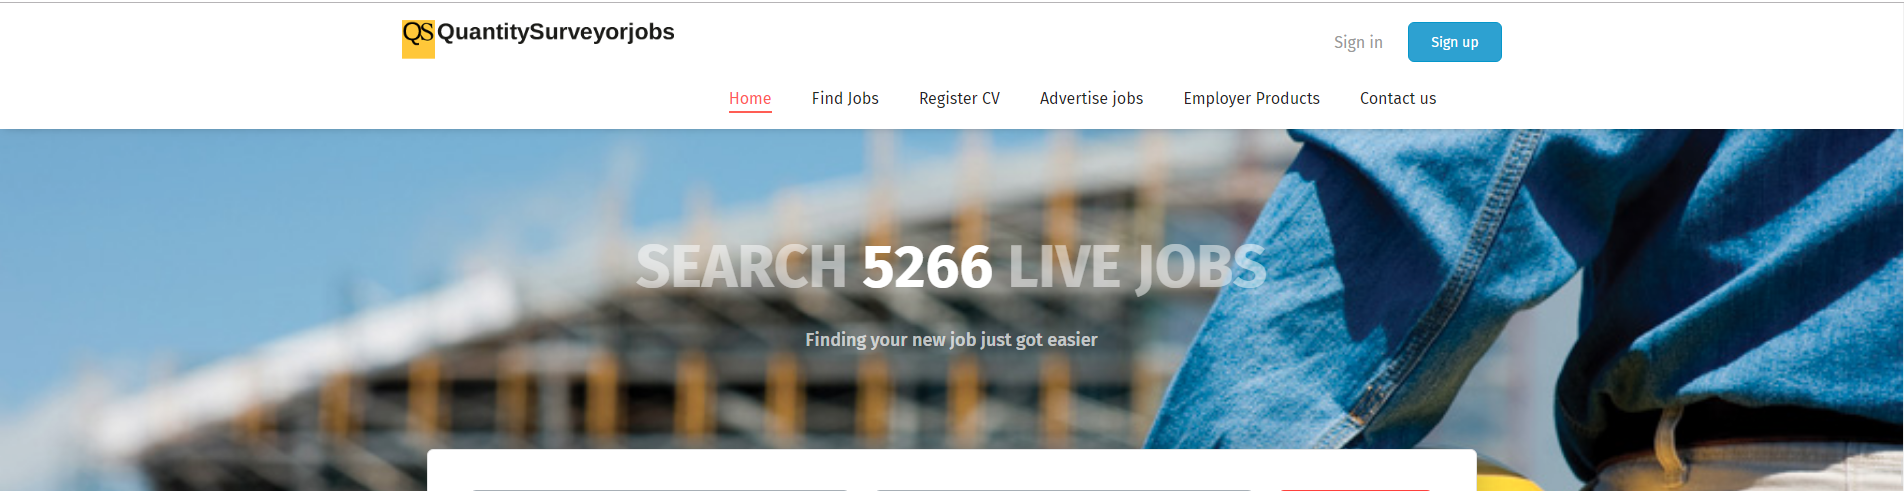 Quantity Surveyor Jobs In Uk Check Out Latest Quantity Surveyor